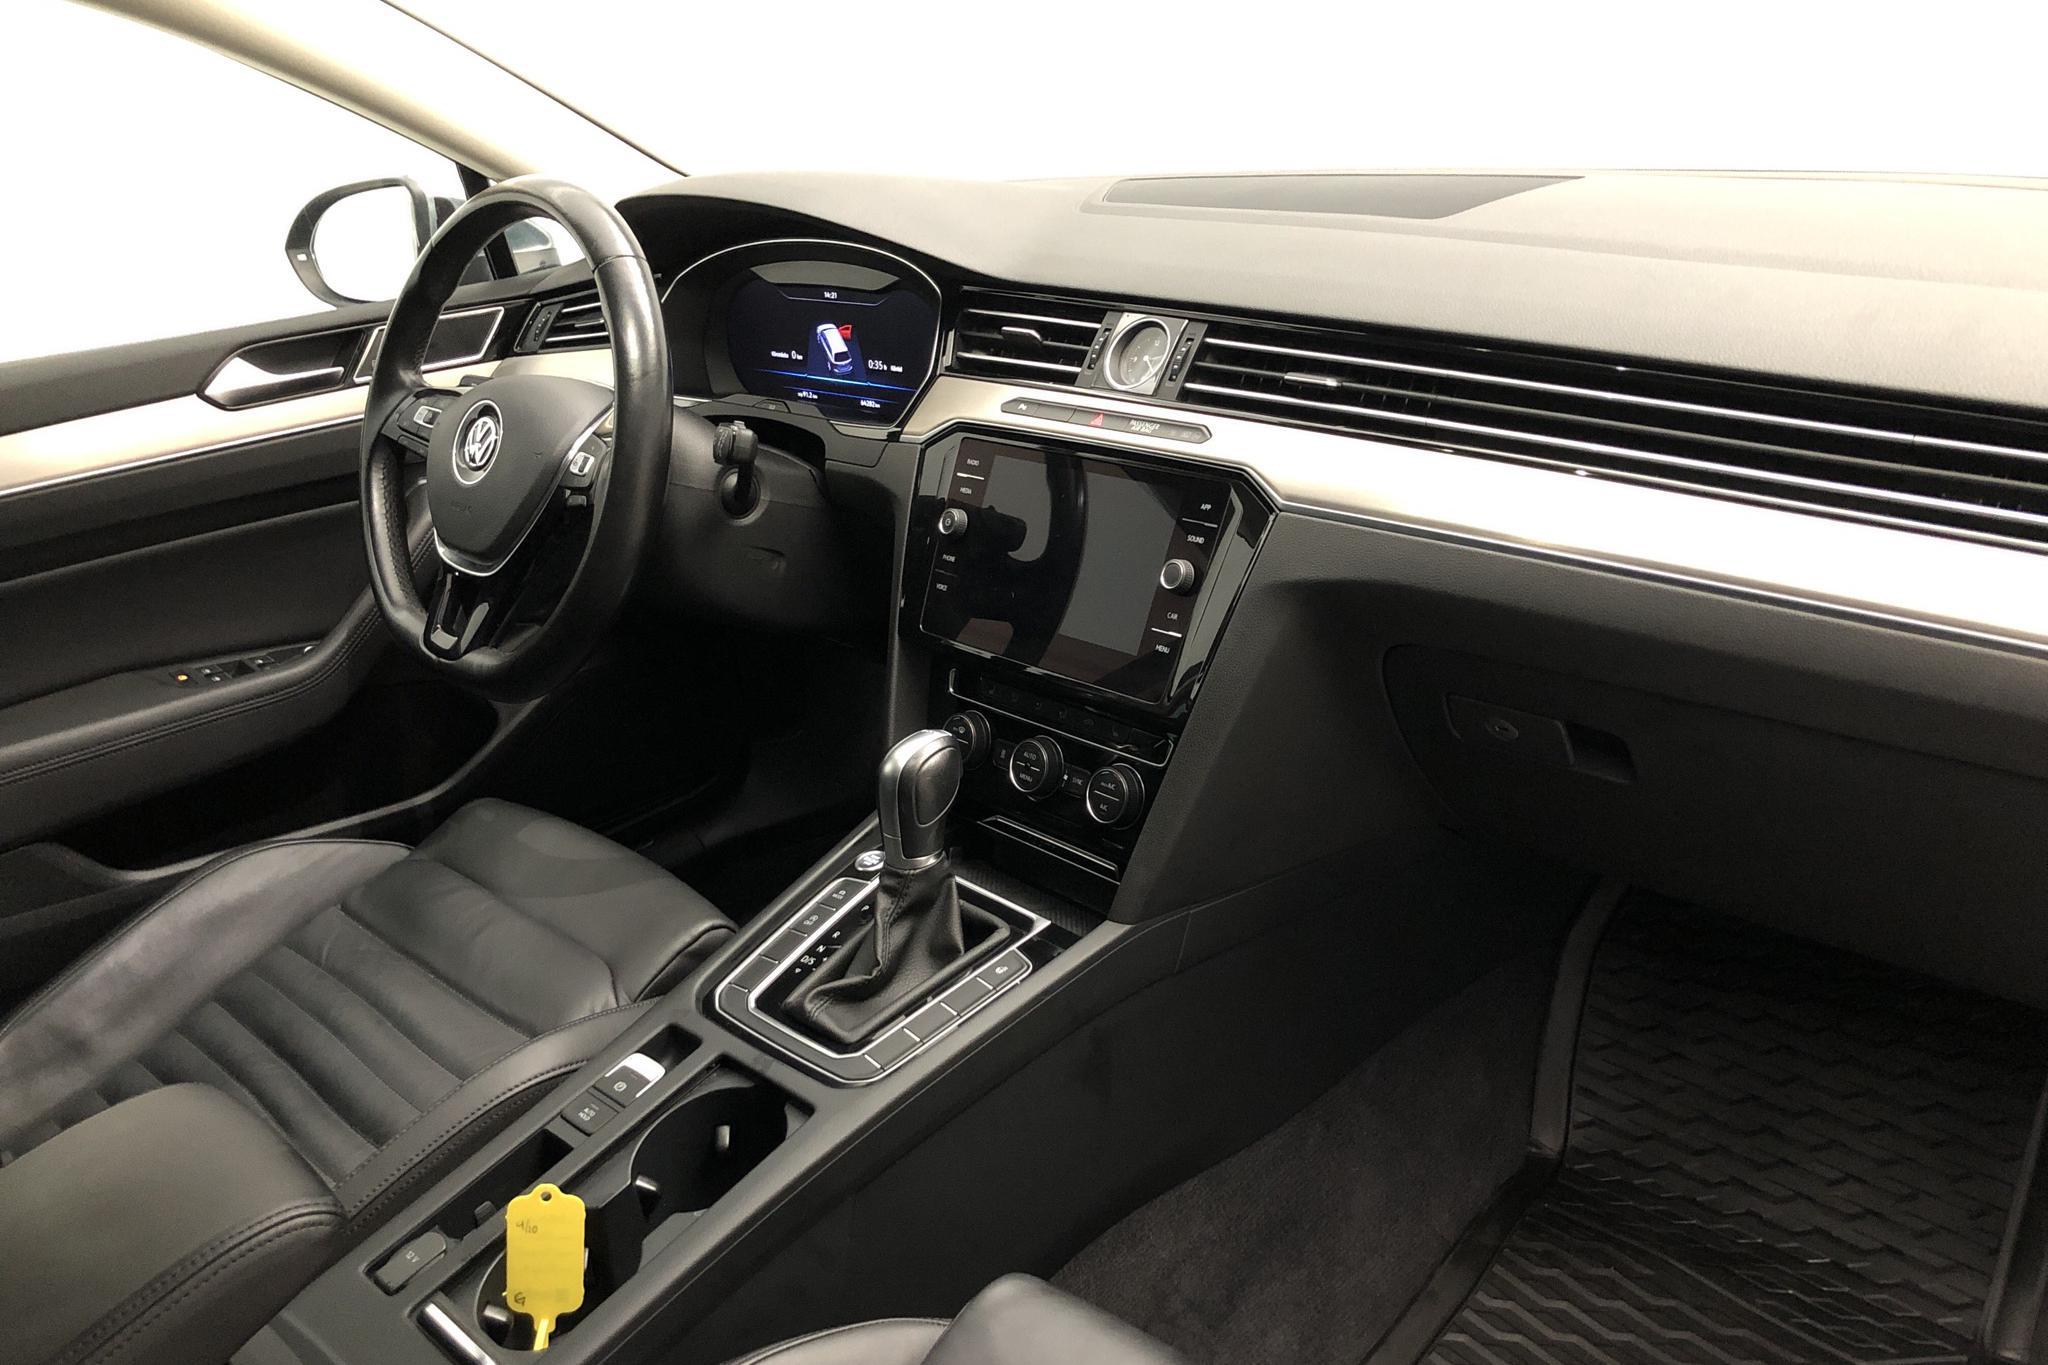 VW Passat Alltrack 2.0 TDI Sportscombi 4MOTION (190hk) - 6 428 mil - Automat - Dark Grey - 2018